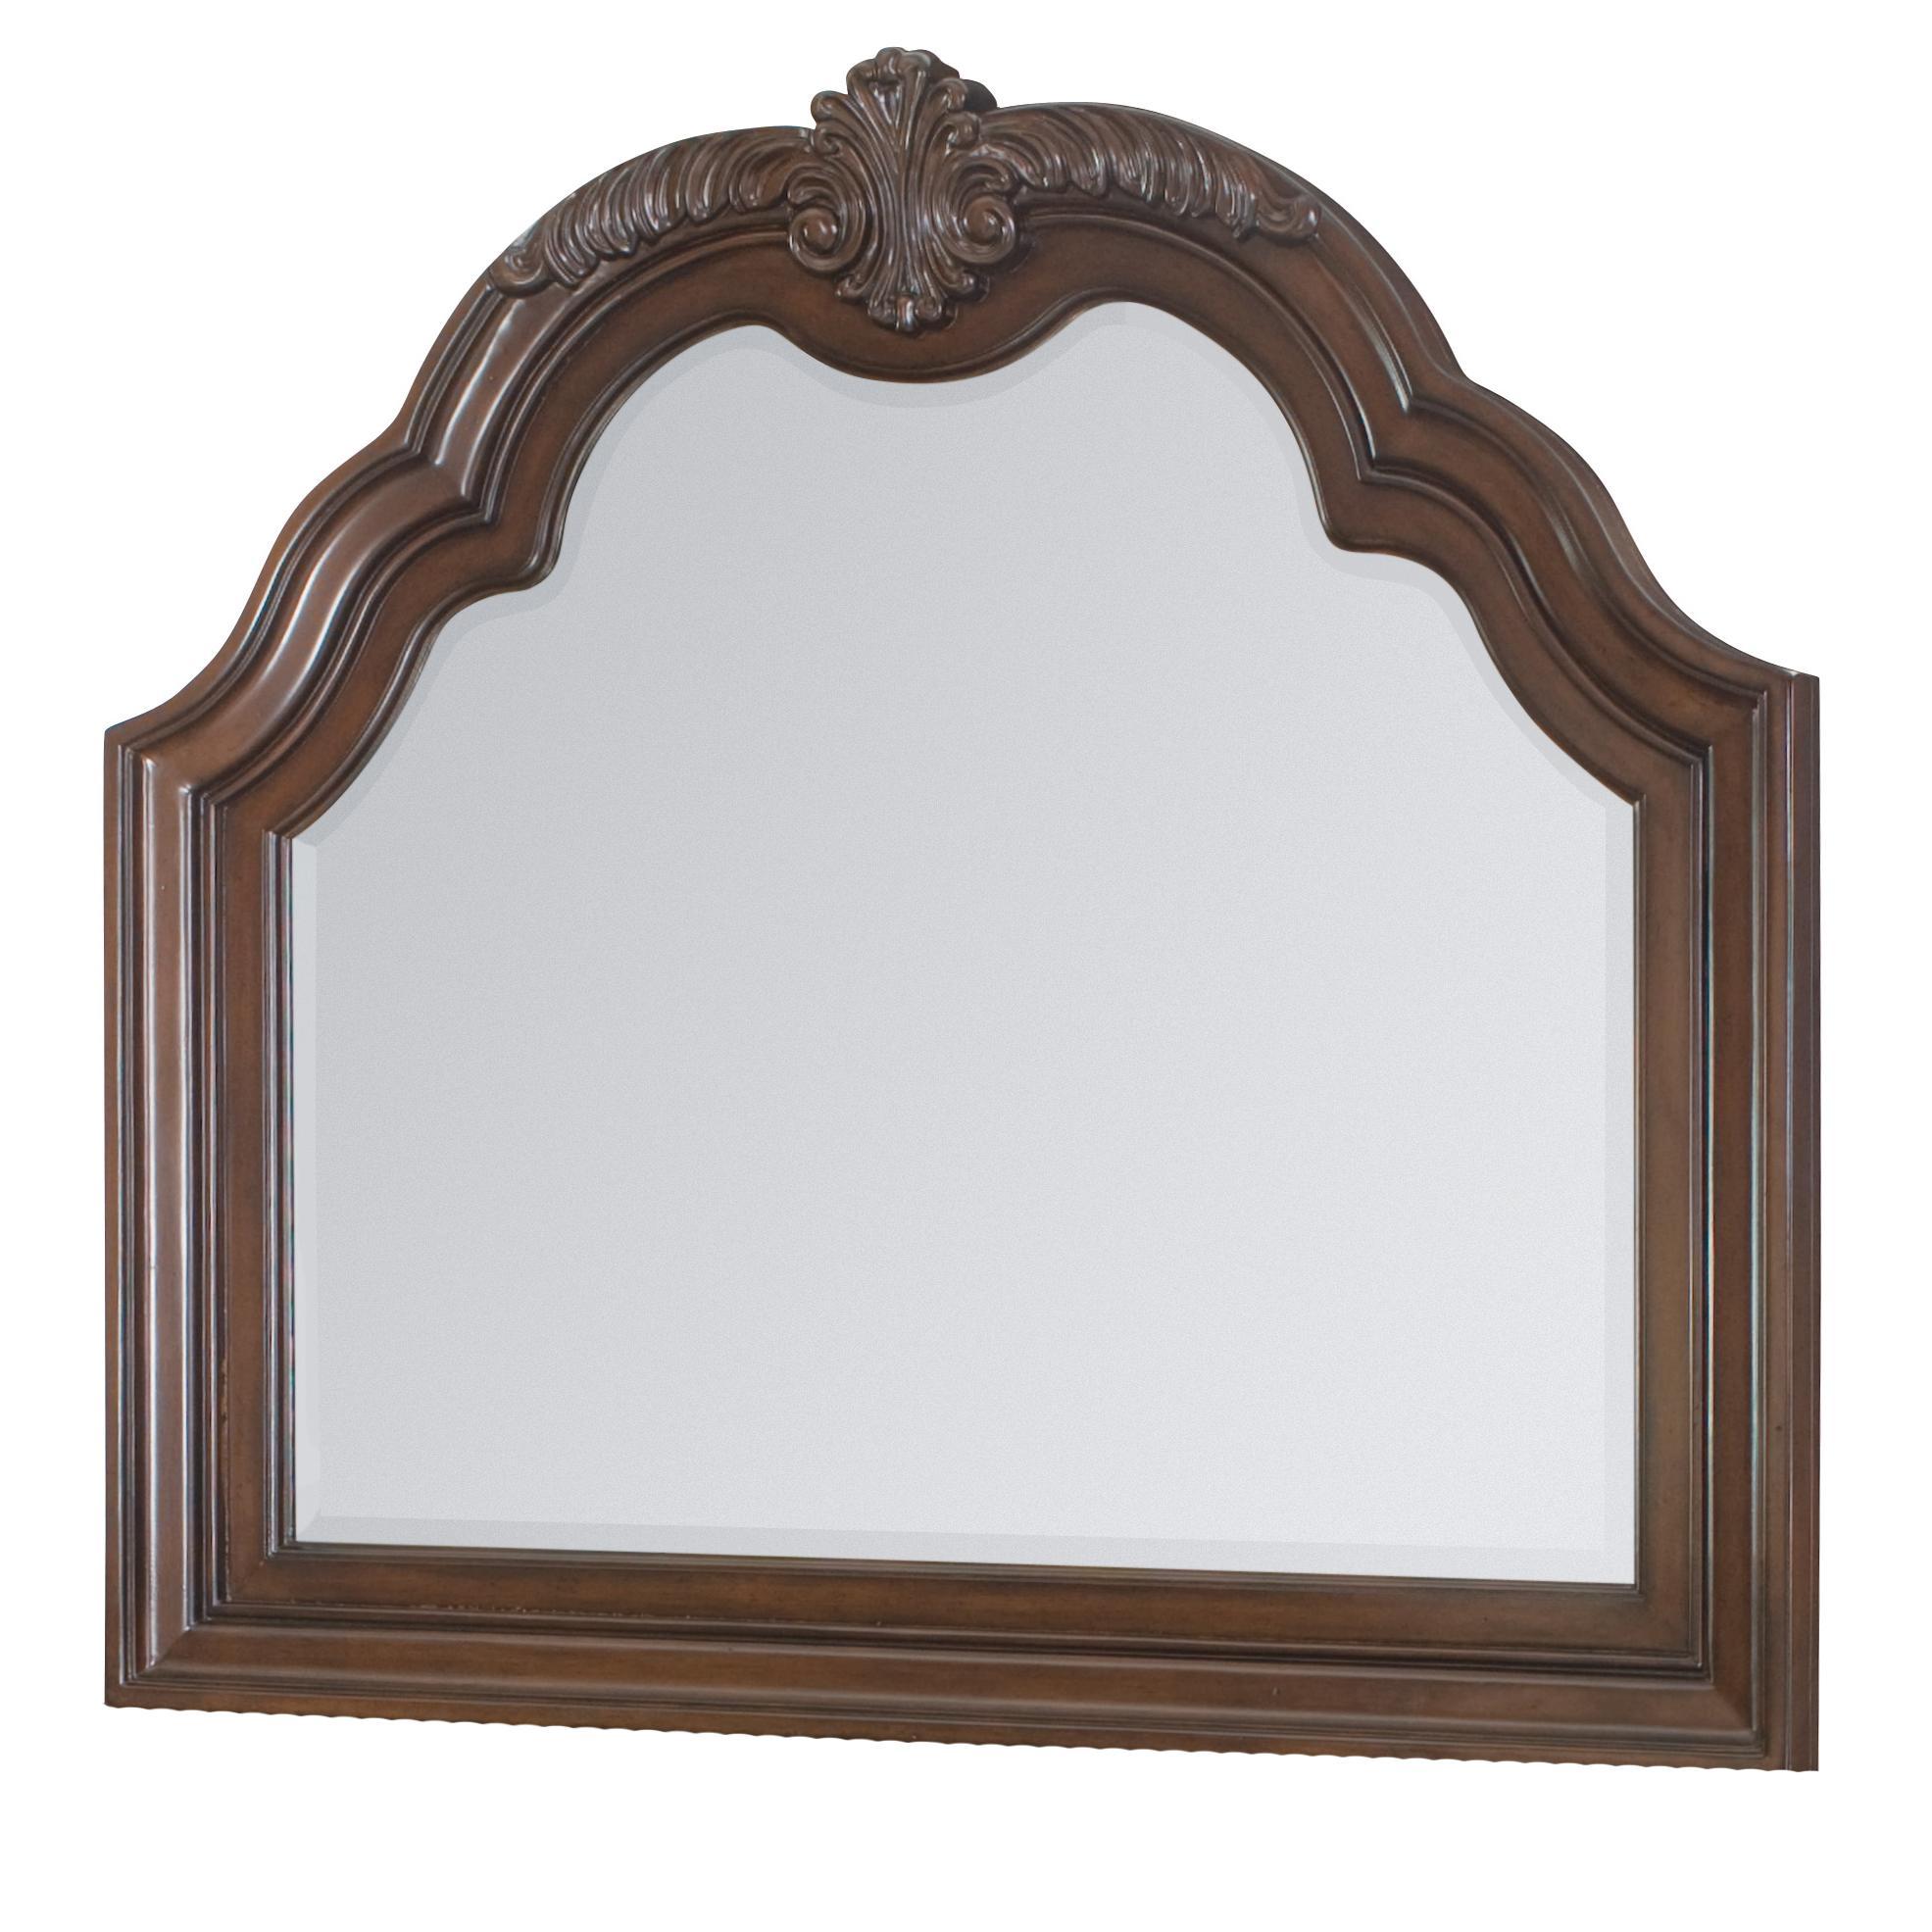 Samuel Lawrence Edington Landscape Mirror - Item Number: 8328-030